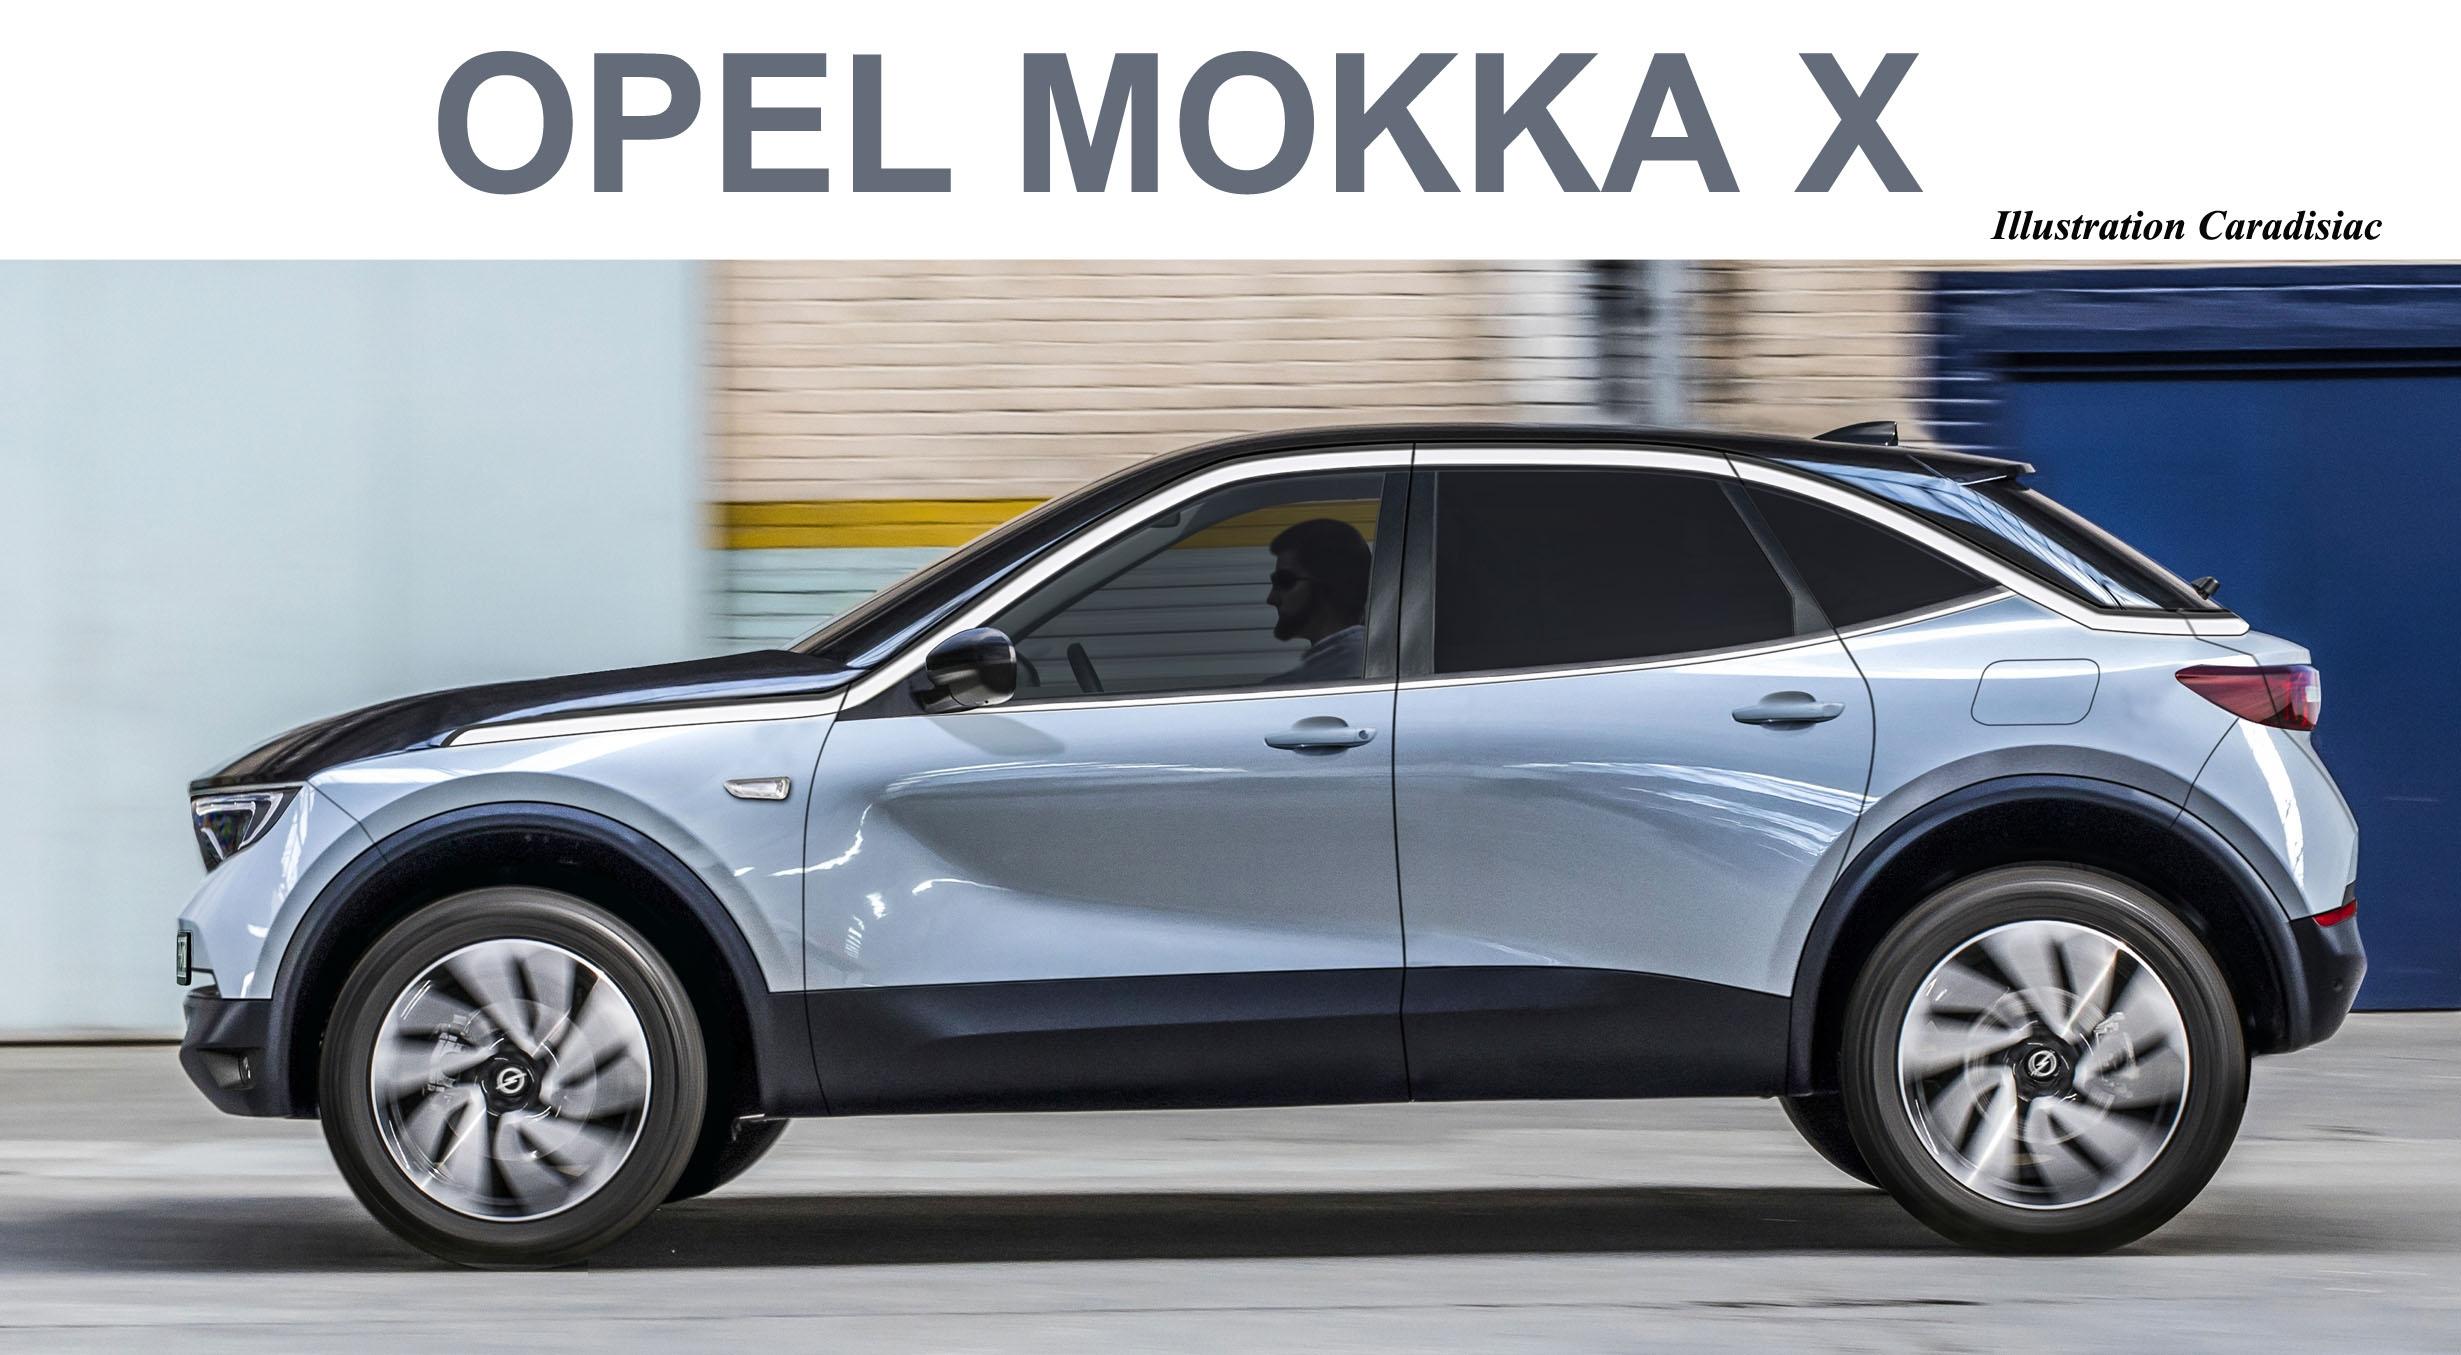 le nouveau opel mokka x arrive en 2020. Black Bedroom Furniture Sets. Home Design Ideas